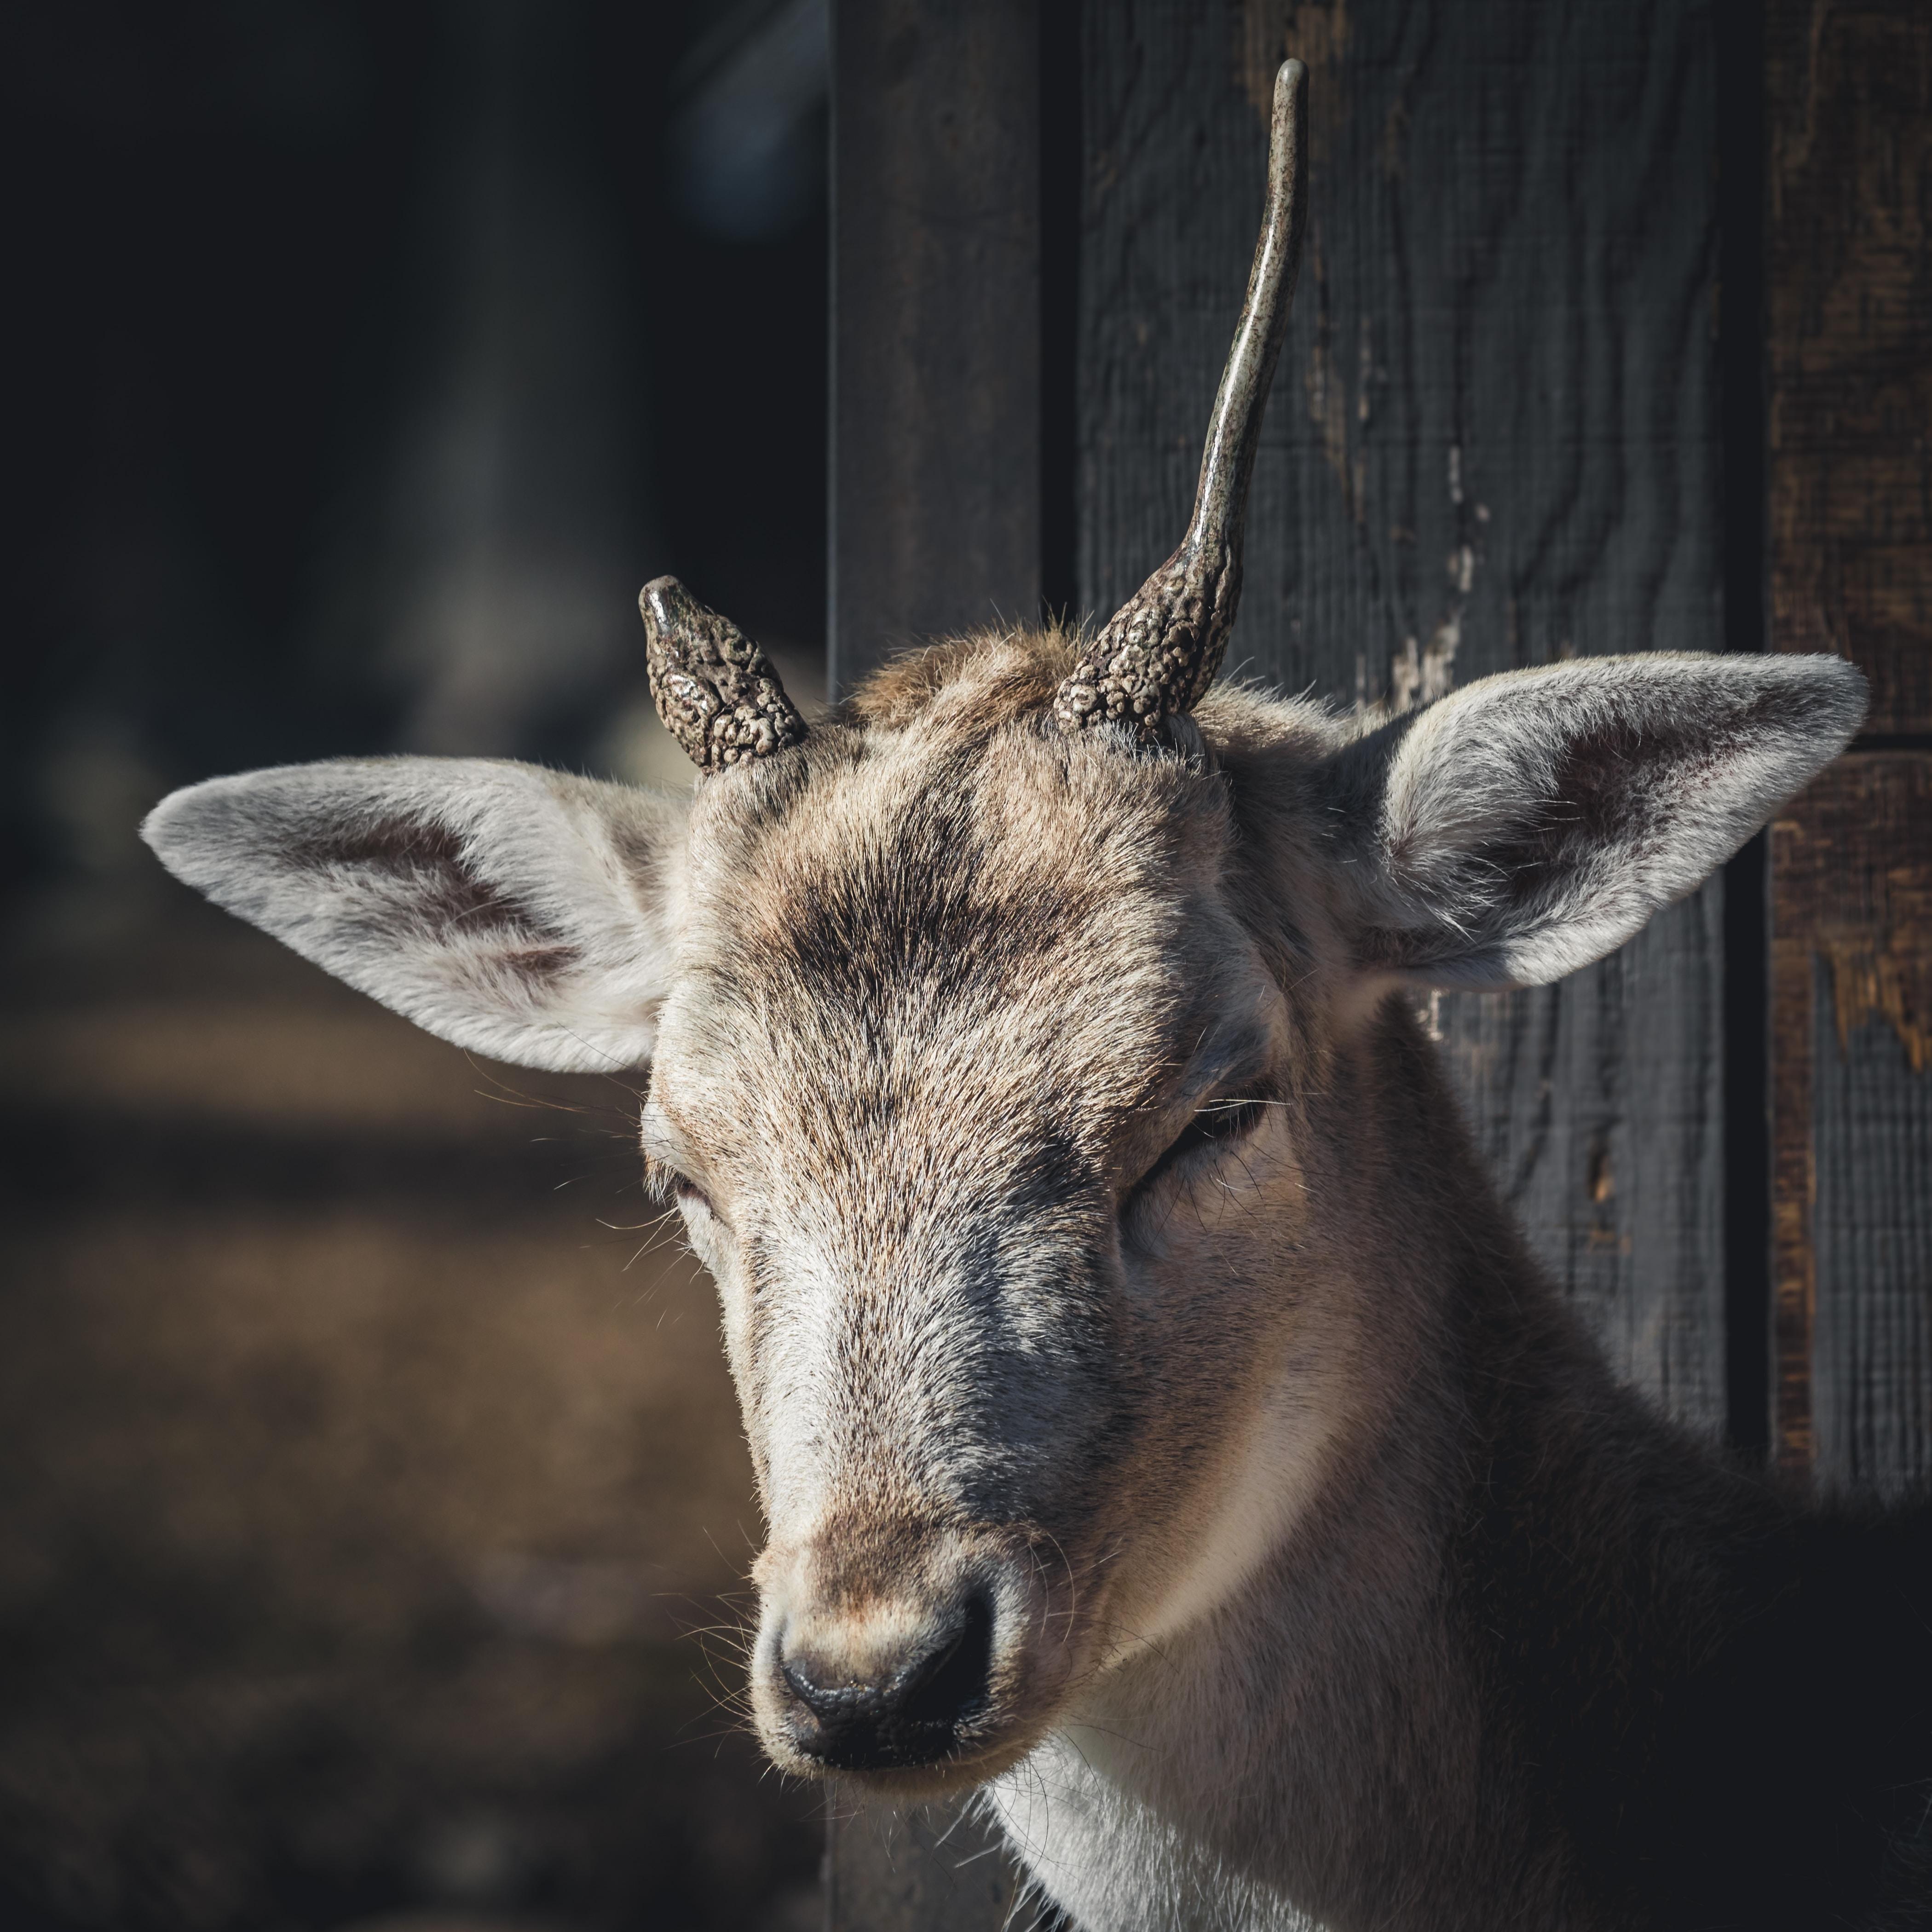 selective focus photography of brown deer standing beside gray wooden wall